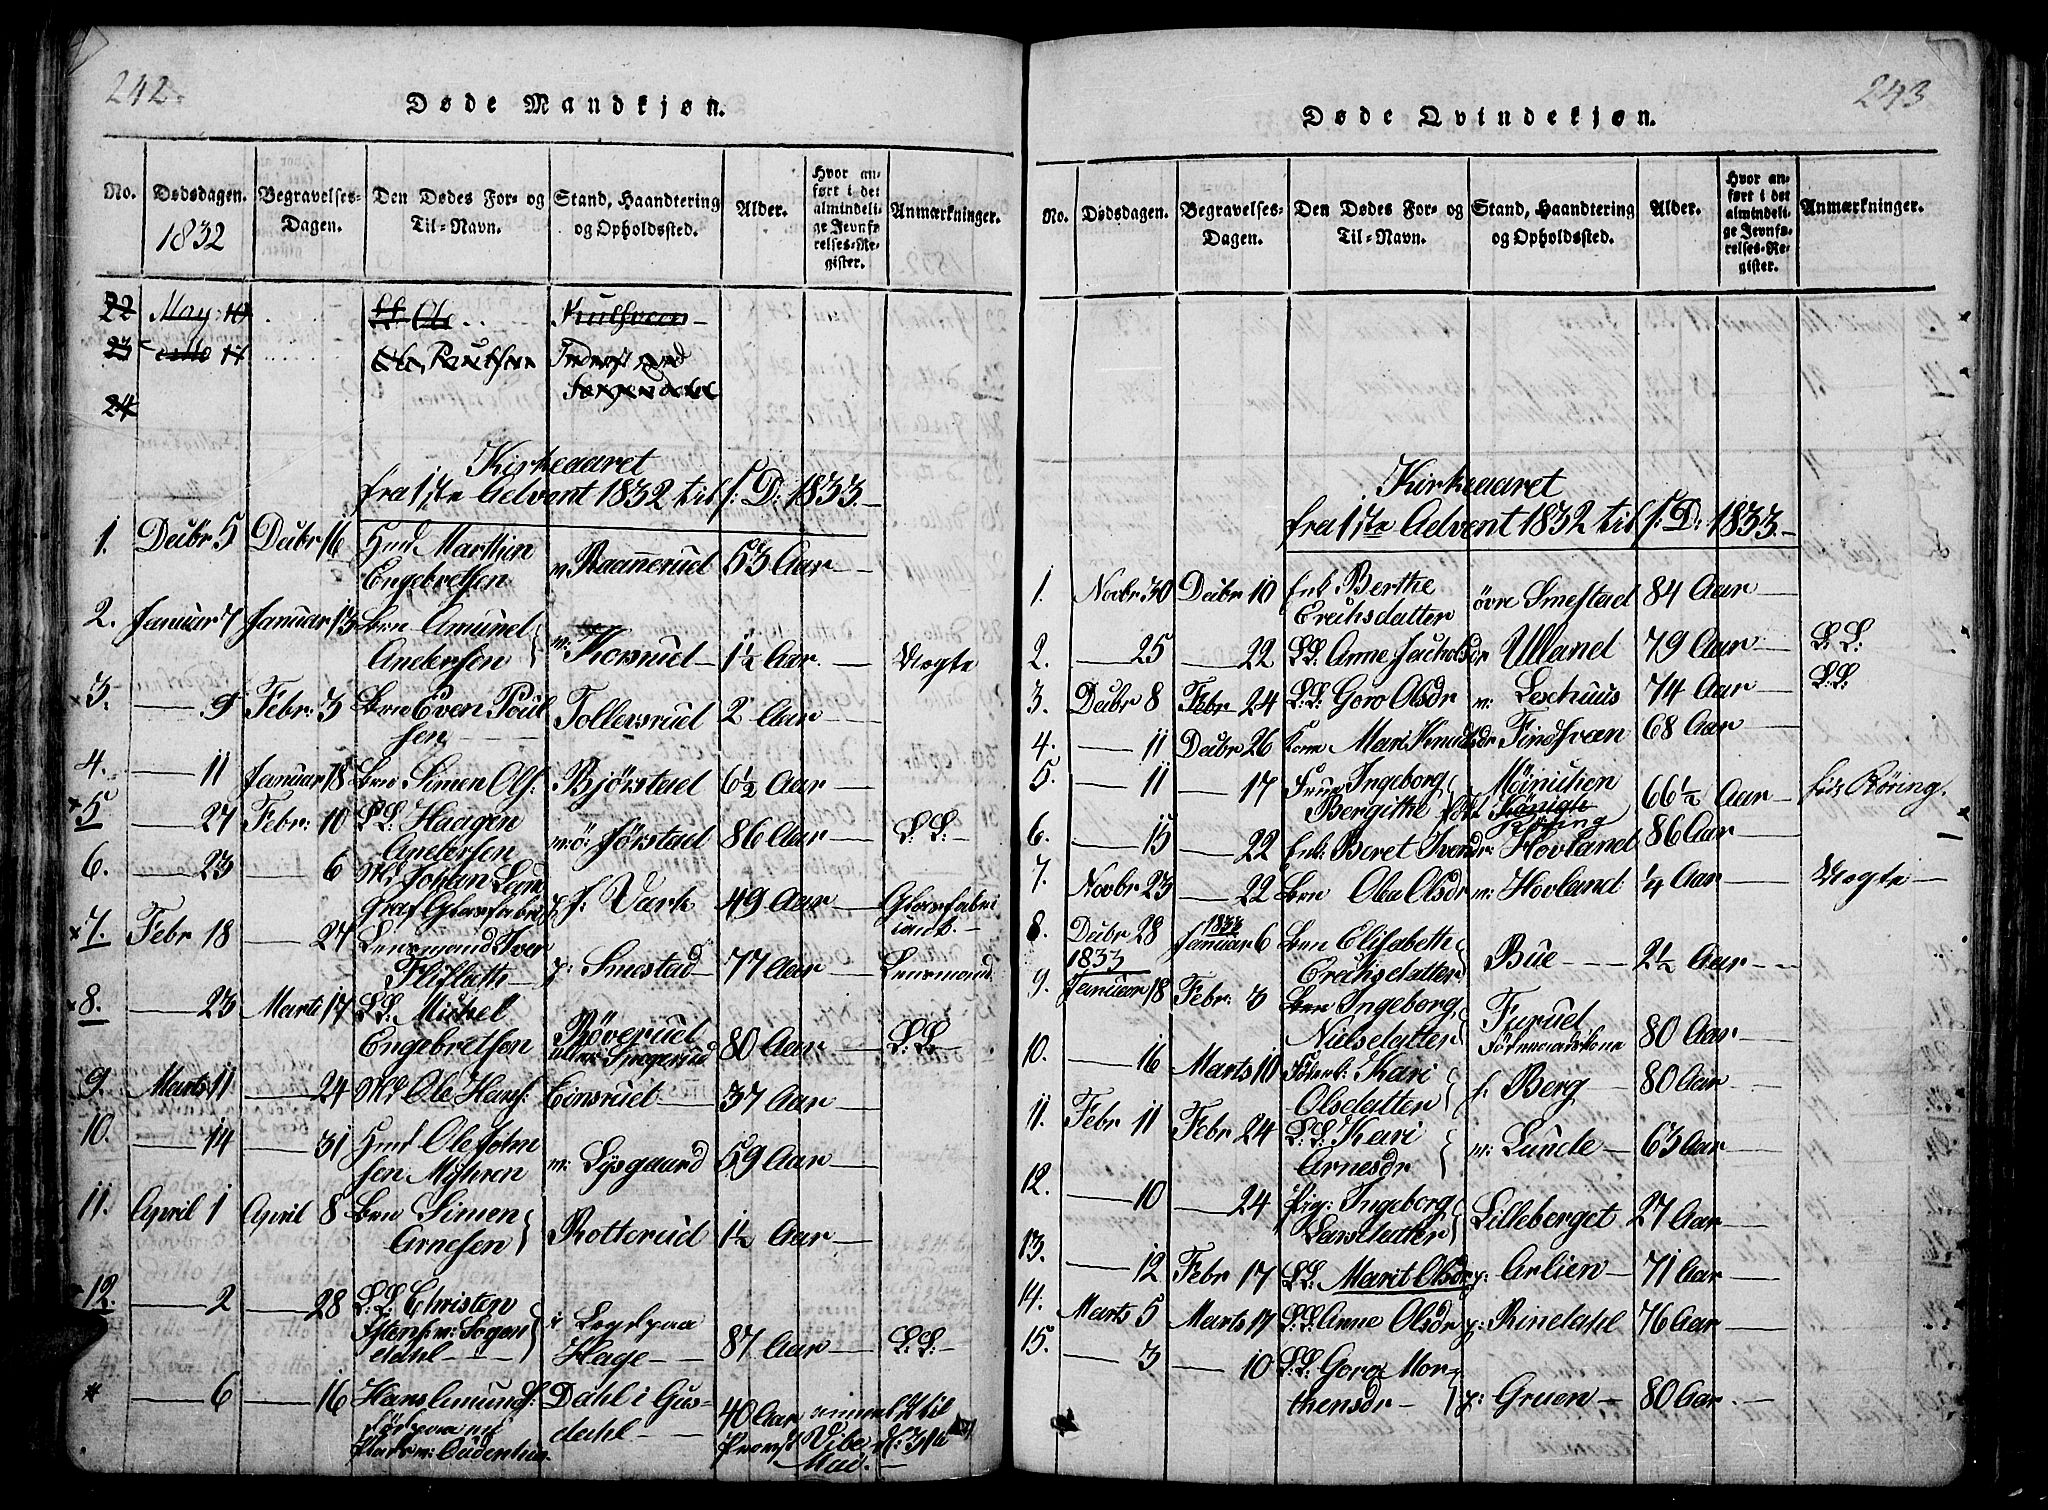 SAH, Fåberg prestekontor, Ministerialbok nr. 3, 1818-1833, s. 242-243